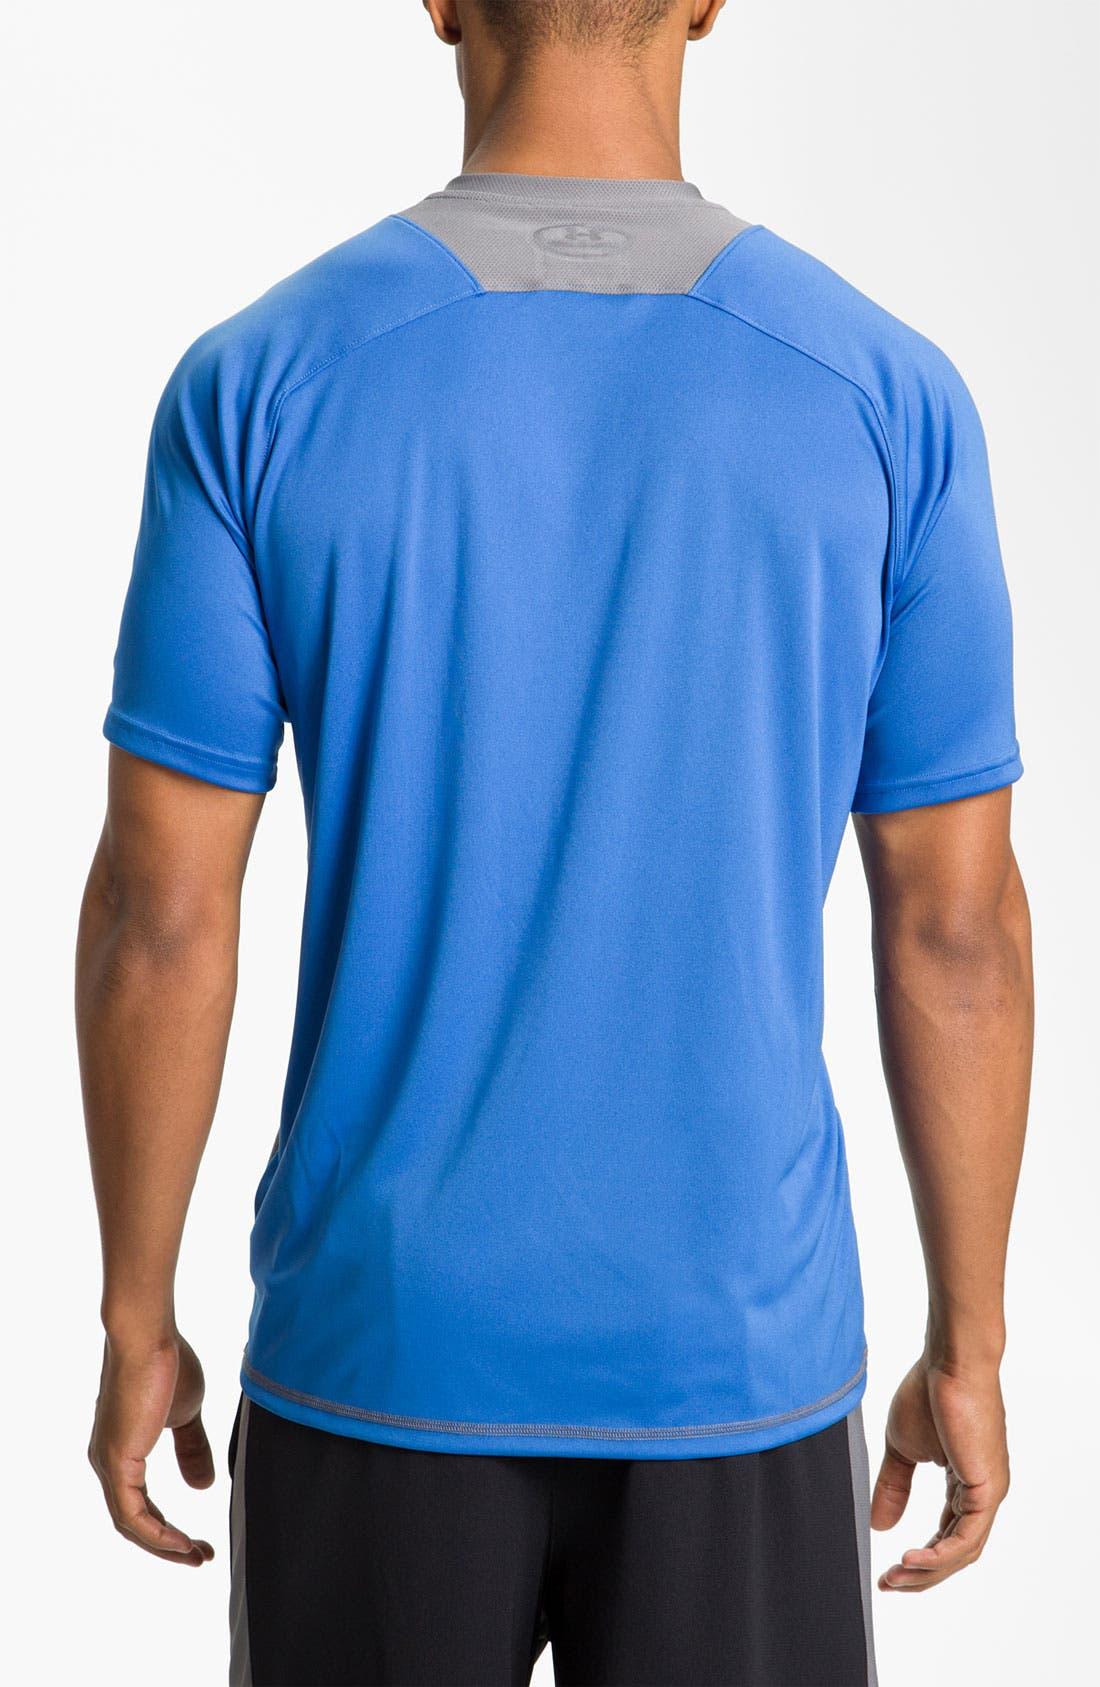 Alternate Image 2  - Under Armour 'Advent' Regular Fit T-Shirt